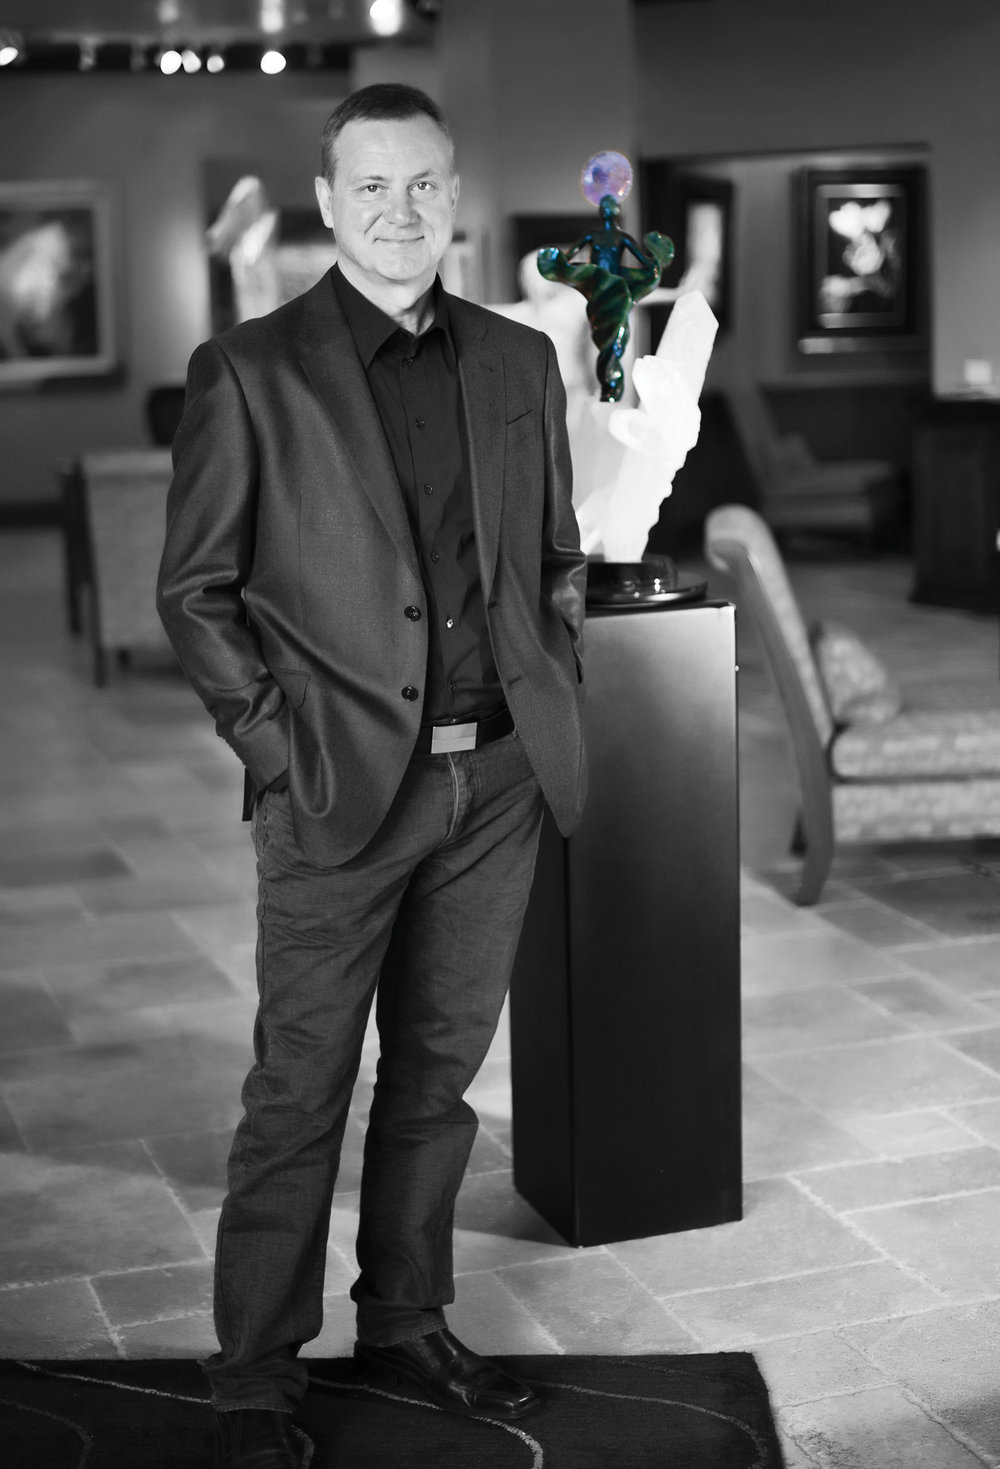 Lyle Sopel是加拿大著名的雕刻家,他專注於運用天然石材的色彩紋理雕琢出栩栩如生的自然主題雕塑,作品被來自世界各地的收藏家們收藏。